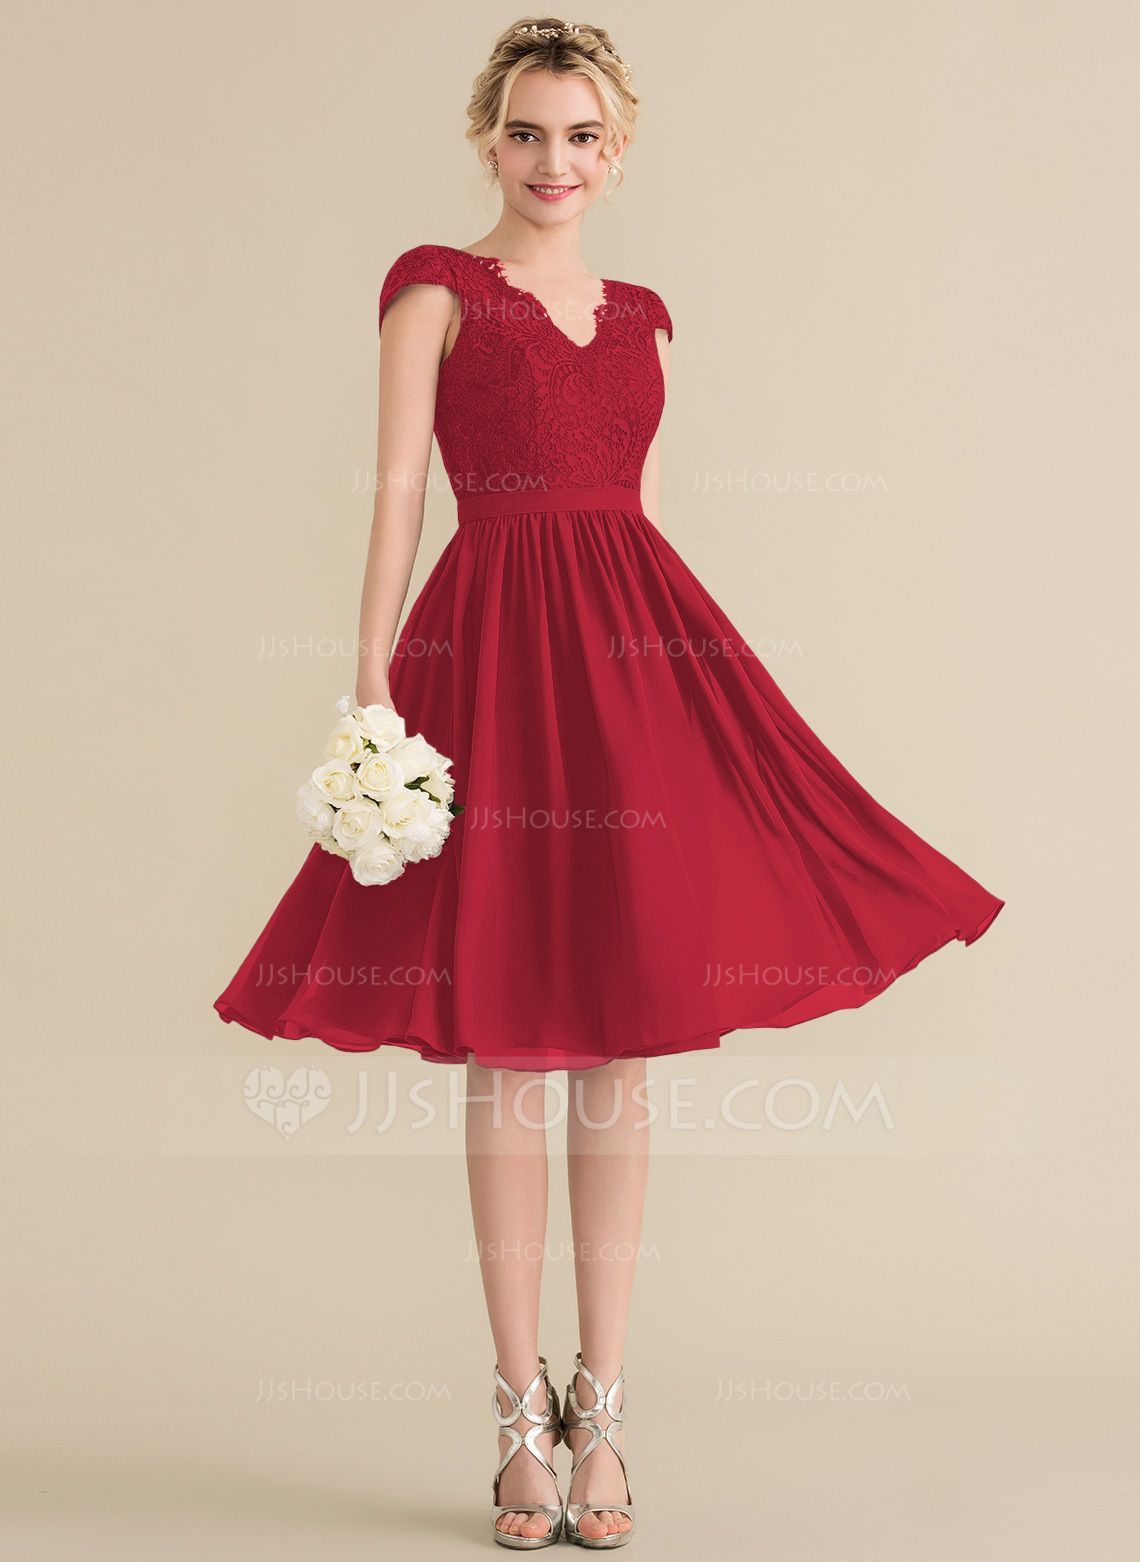 afd5f247162e13 A-Line/Princess V-neck Knee-Length Chiffon Lace Bridesmaid Dress  (007144774) - Bridesmaid Dresses - JJsHouse